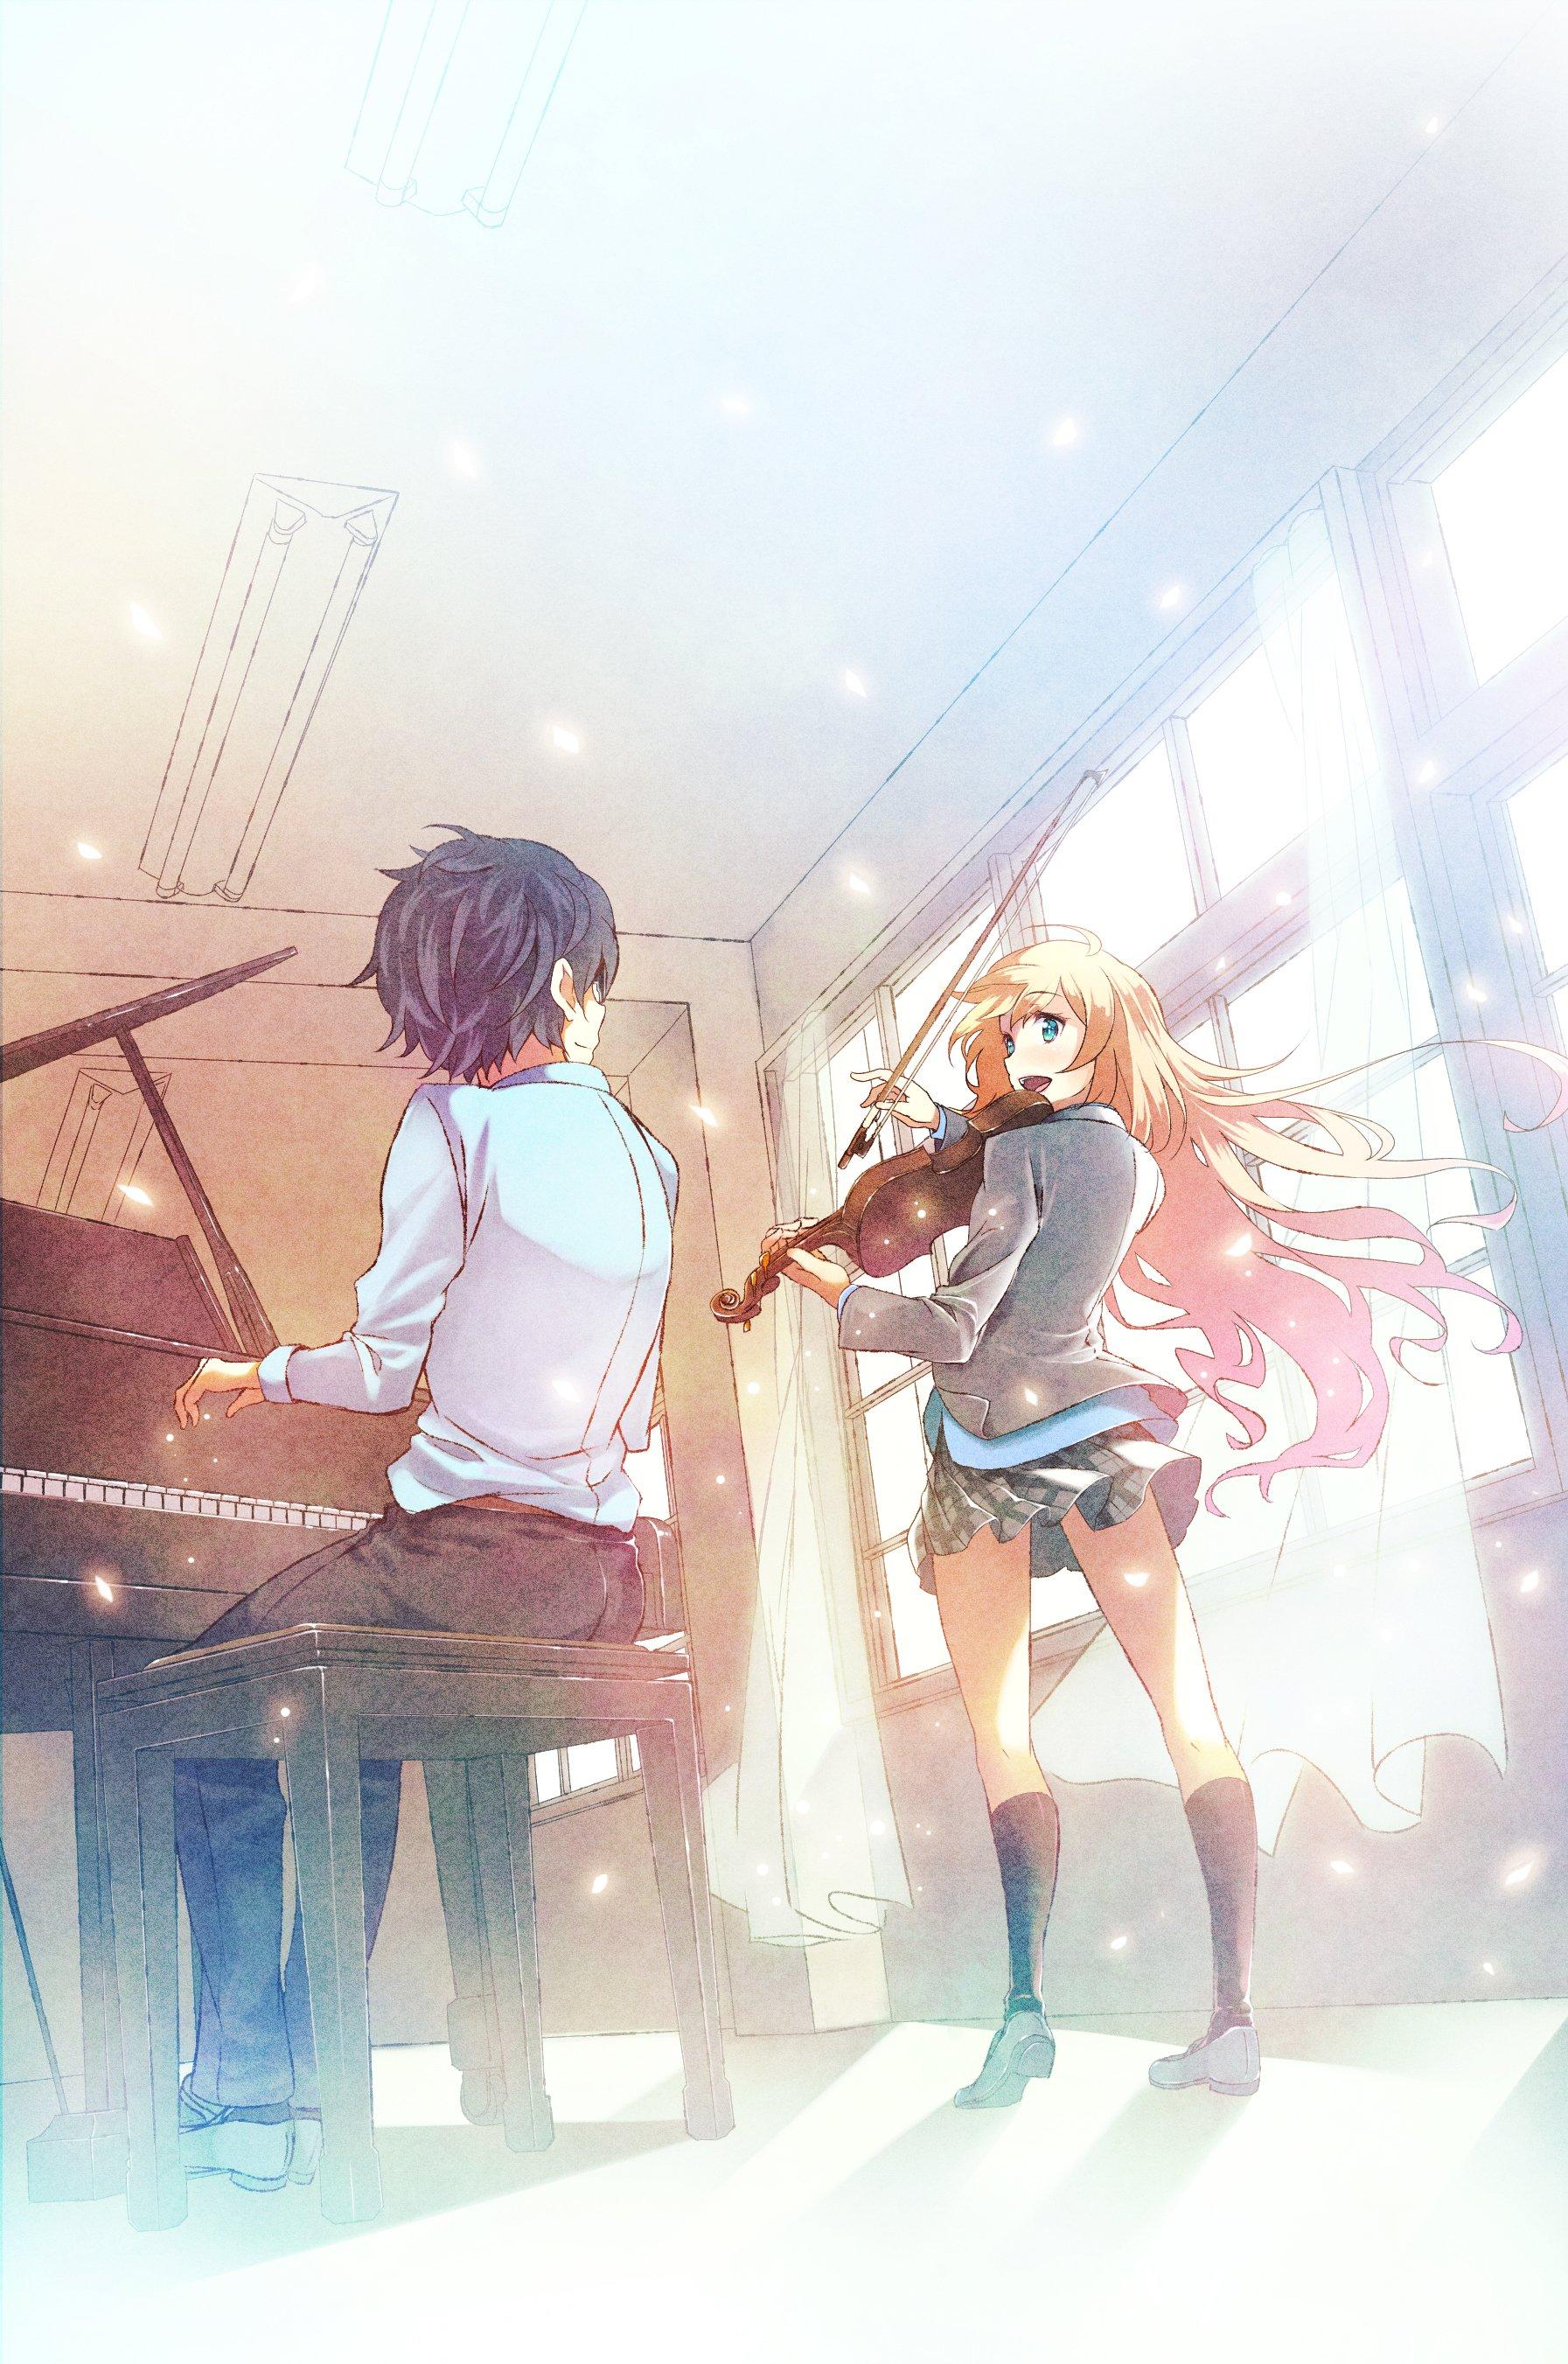 Anime Series Girl Boy Piano Music Violin Wallpaper 1793x2703 683591 Wallpaperup